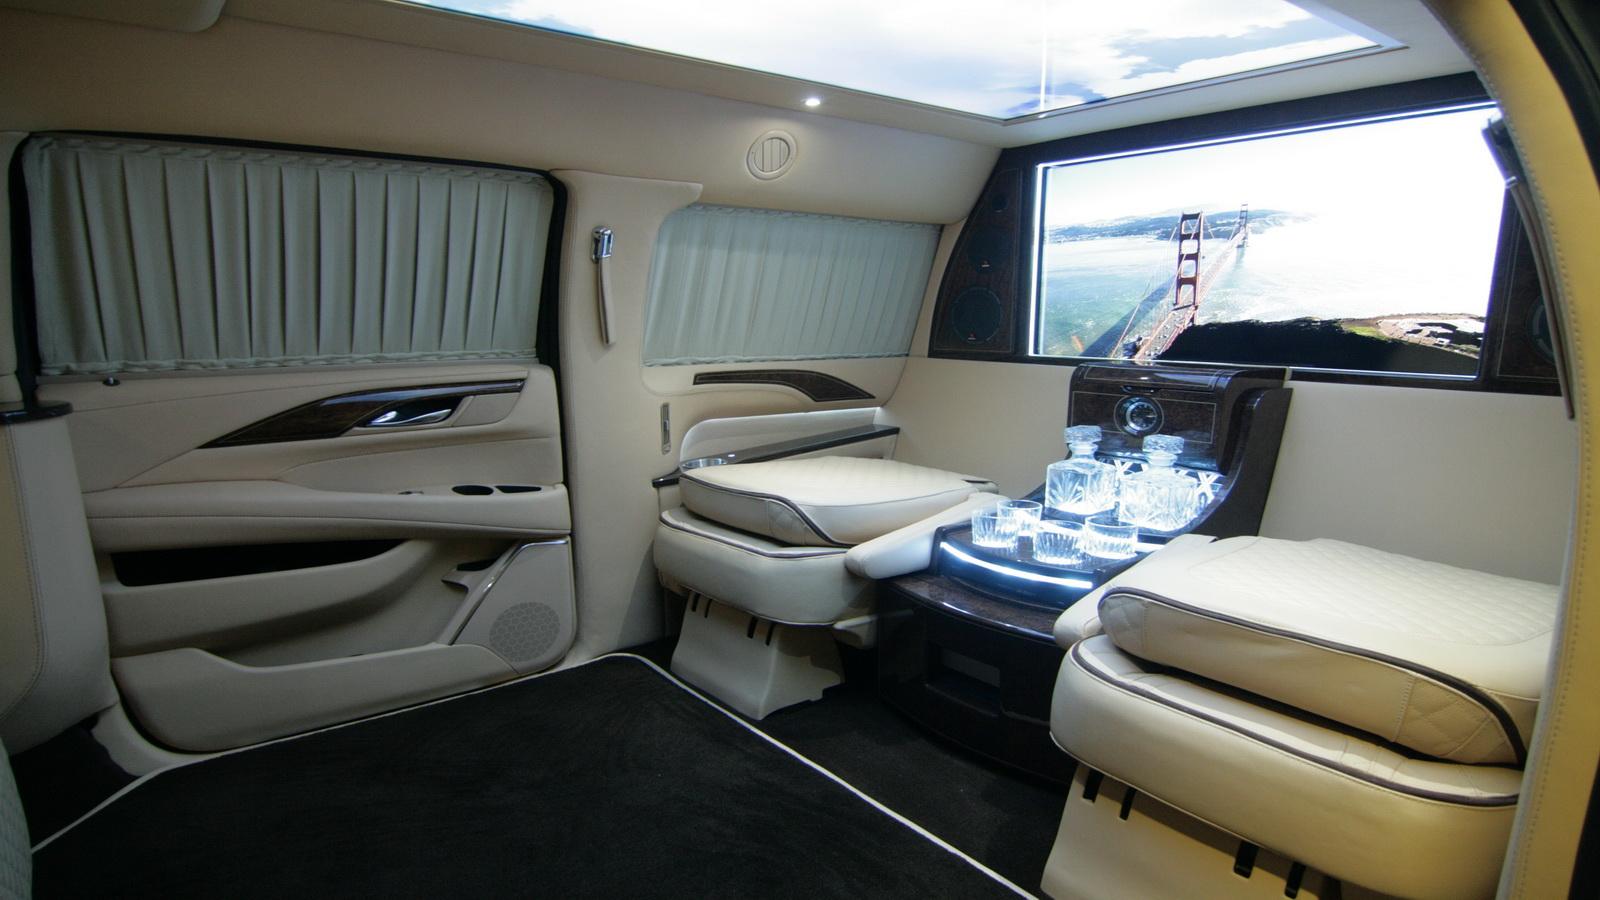 Cadillac escalade conversion suvs hq custom design for Cadillac escalade custom interior